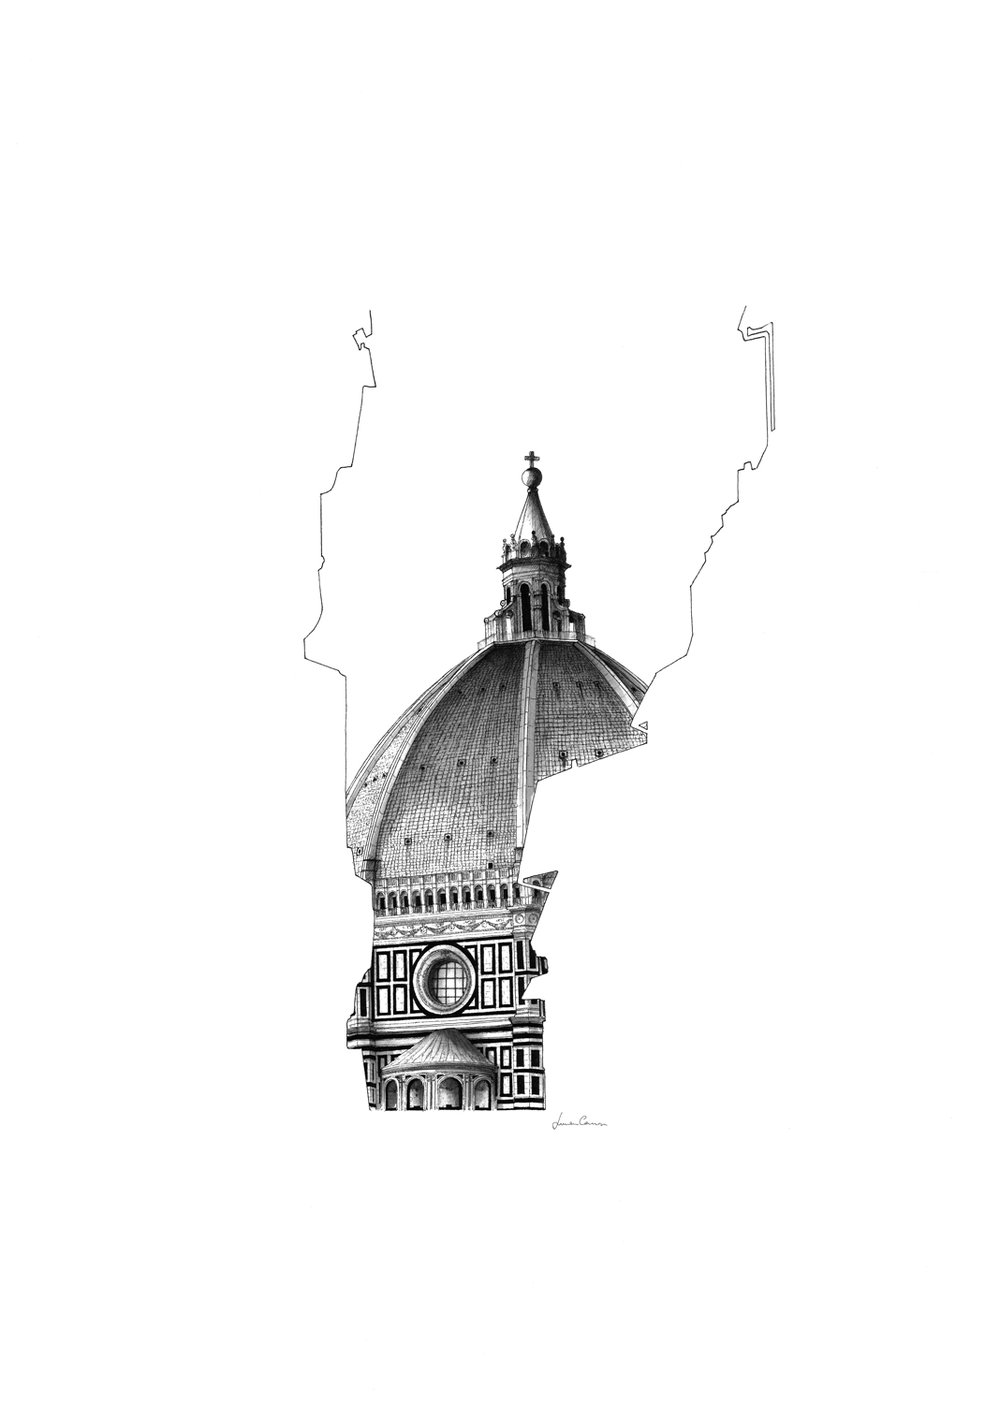 Cattedrale di Santa Maria del Fiore 02 - Firenze